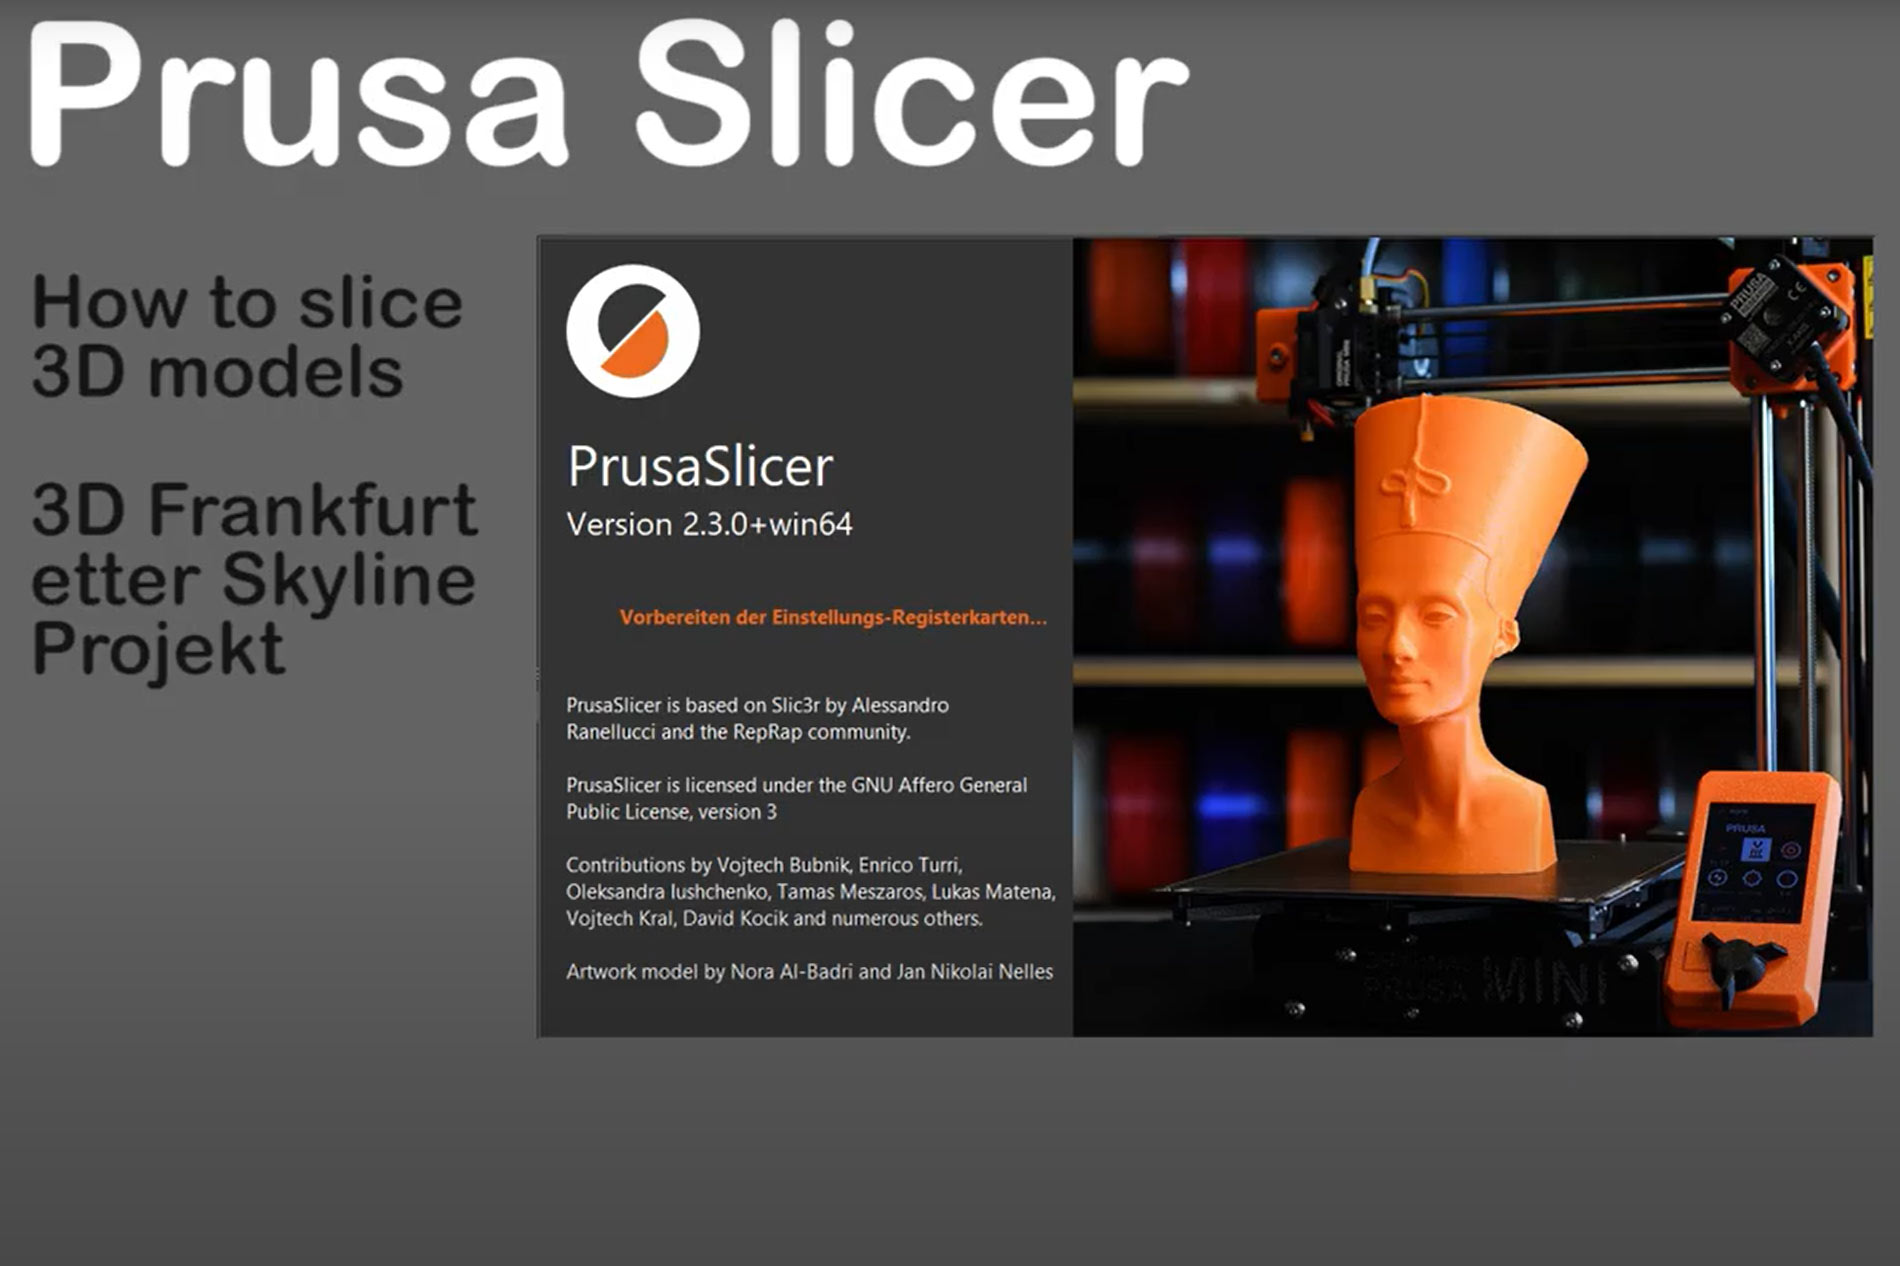 Prusa Slicer